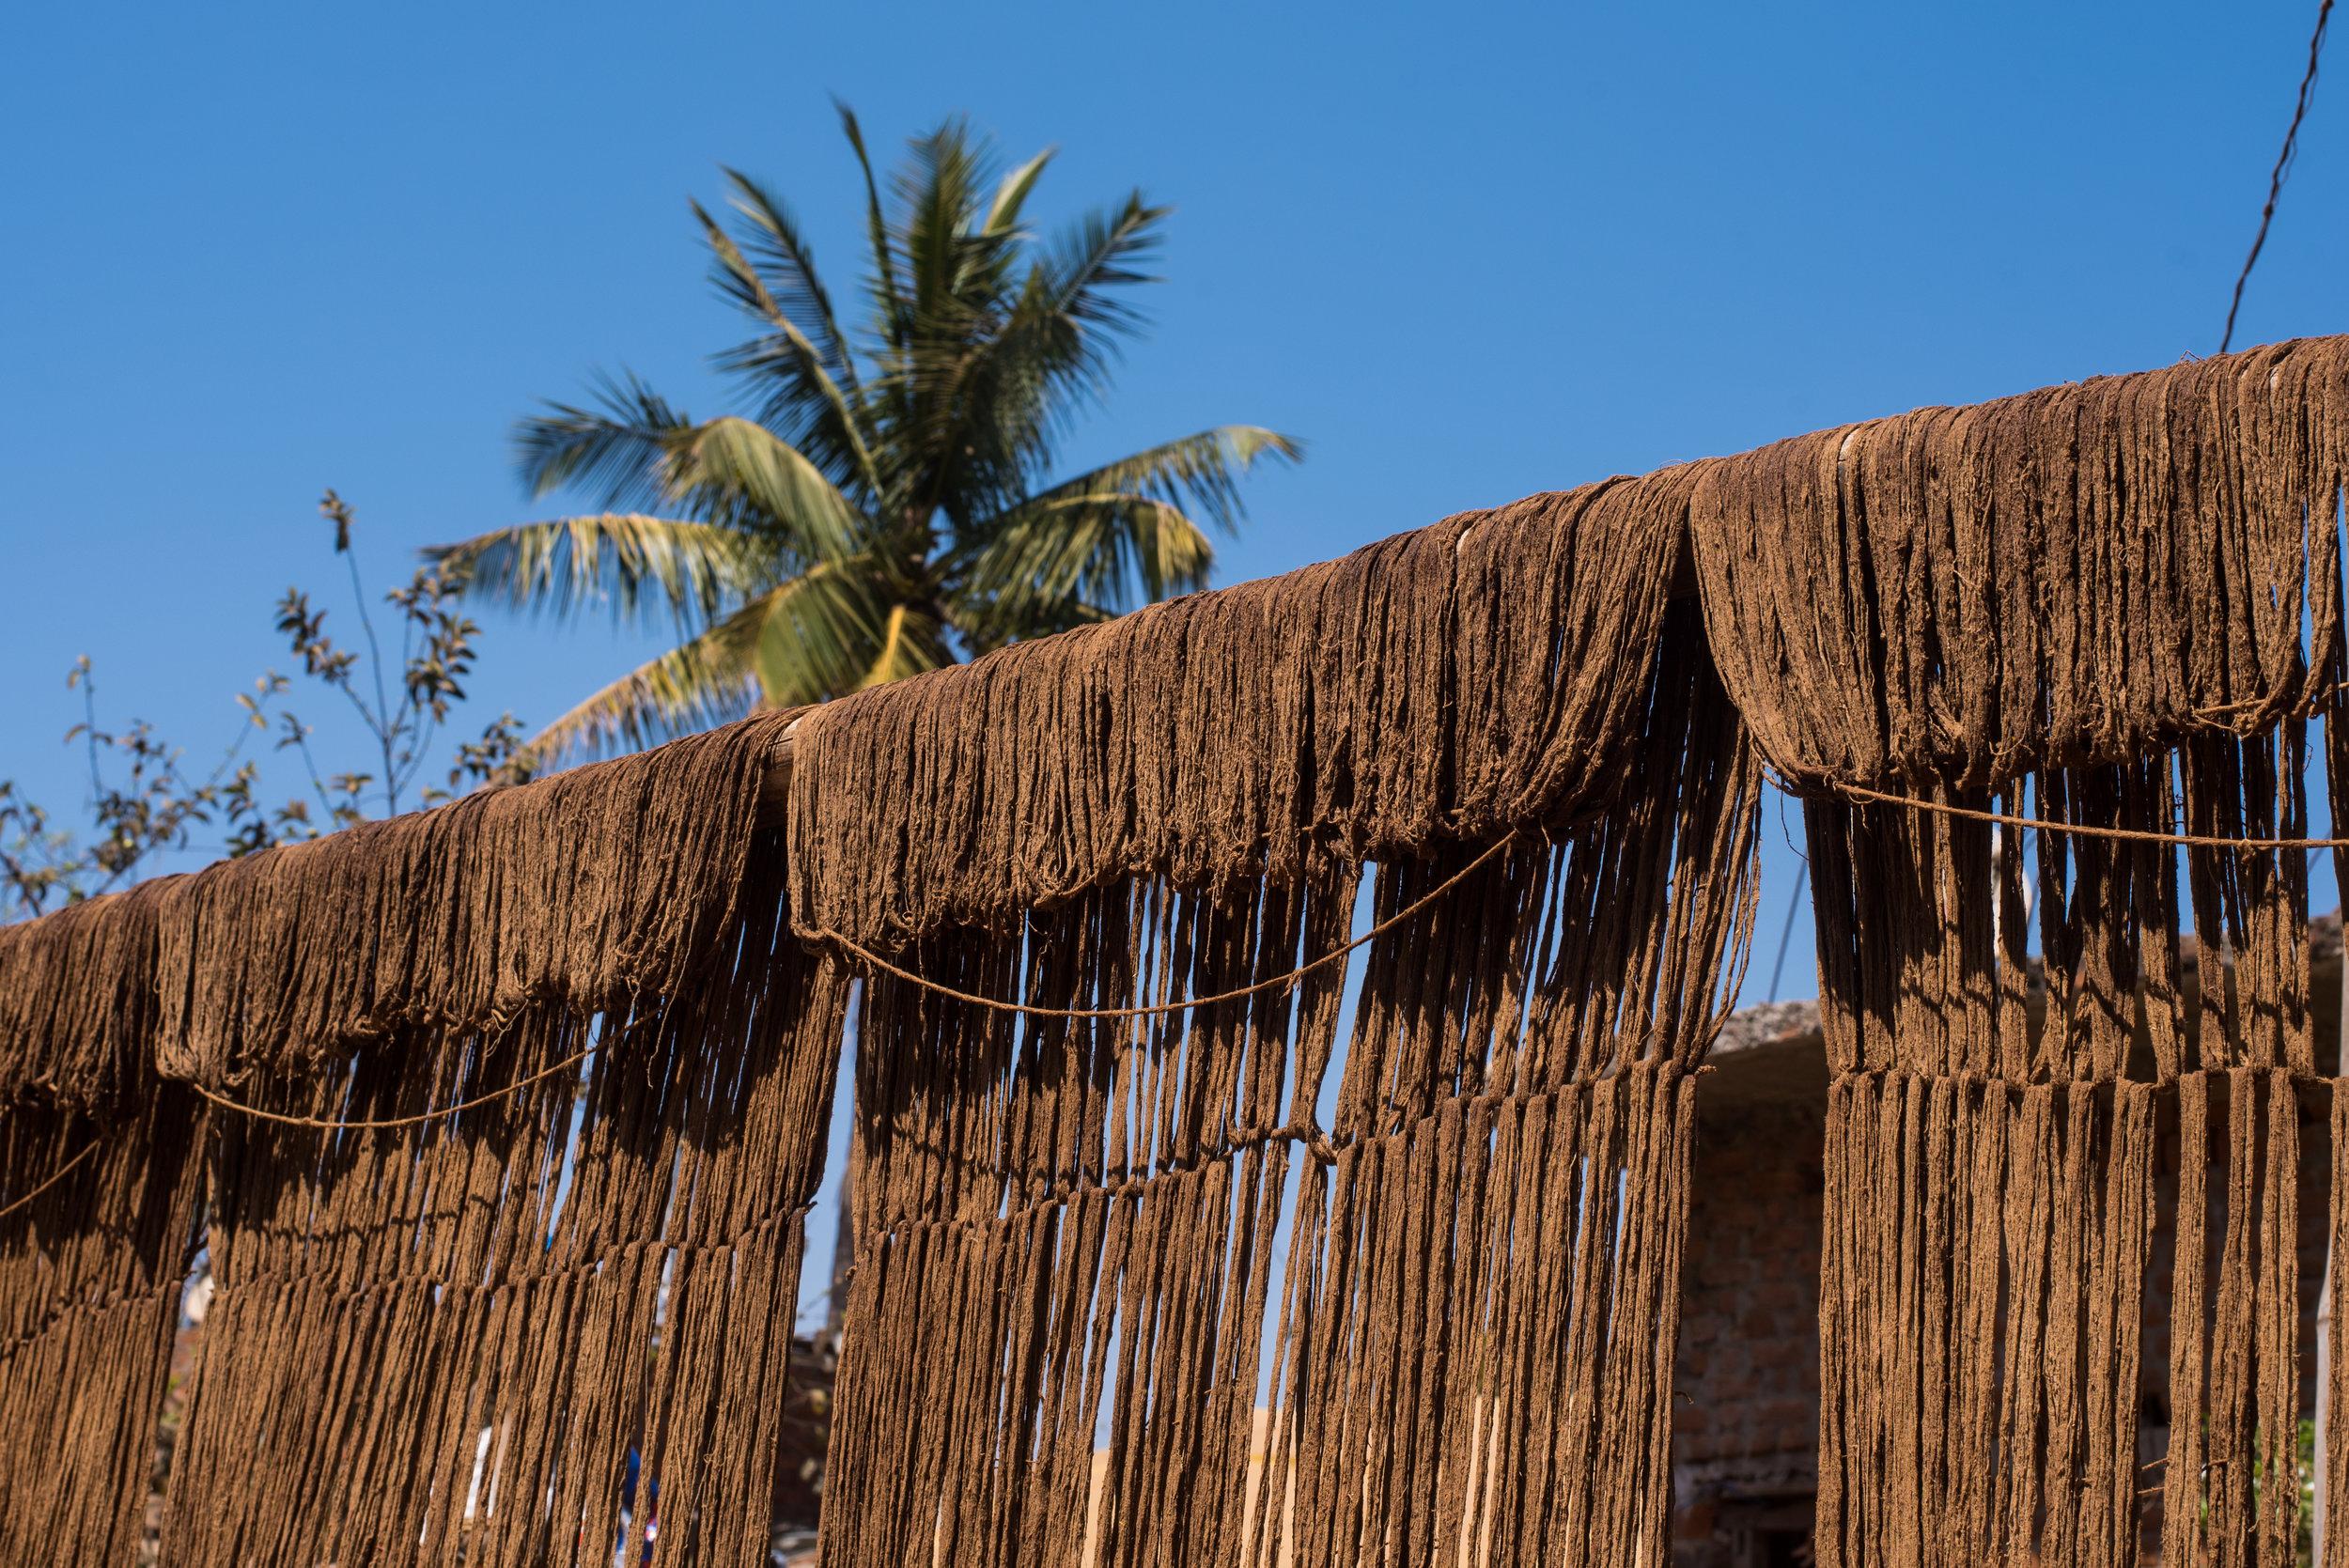 Yarn drying on bamboo poles